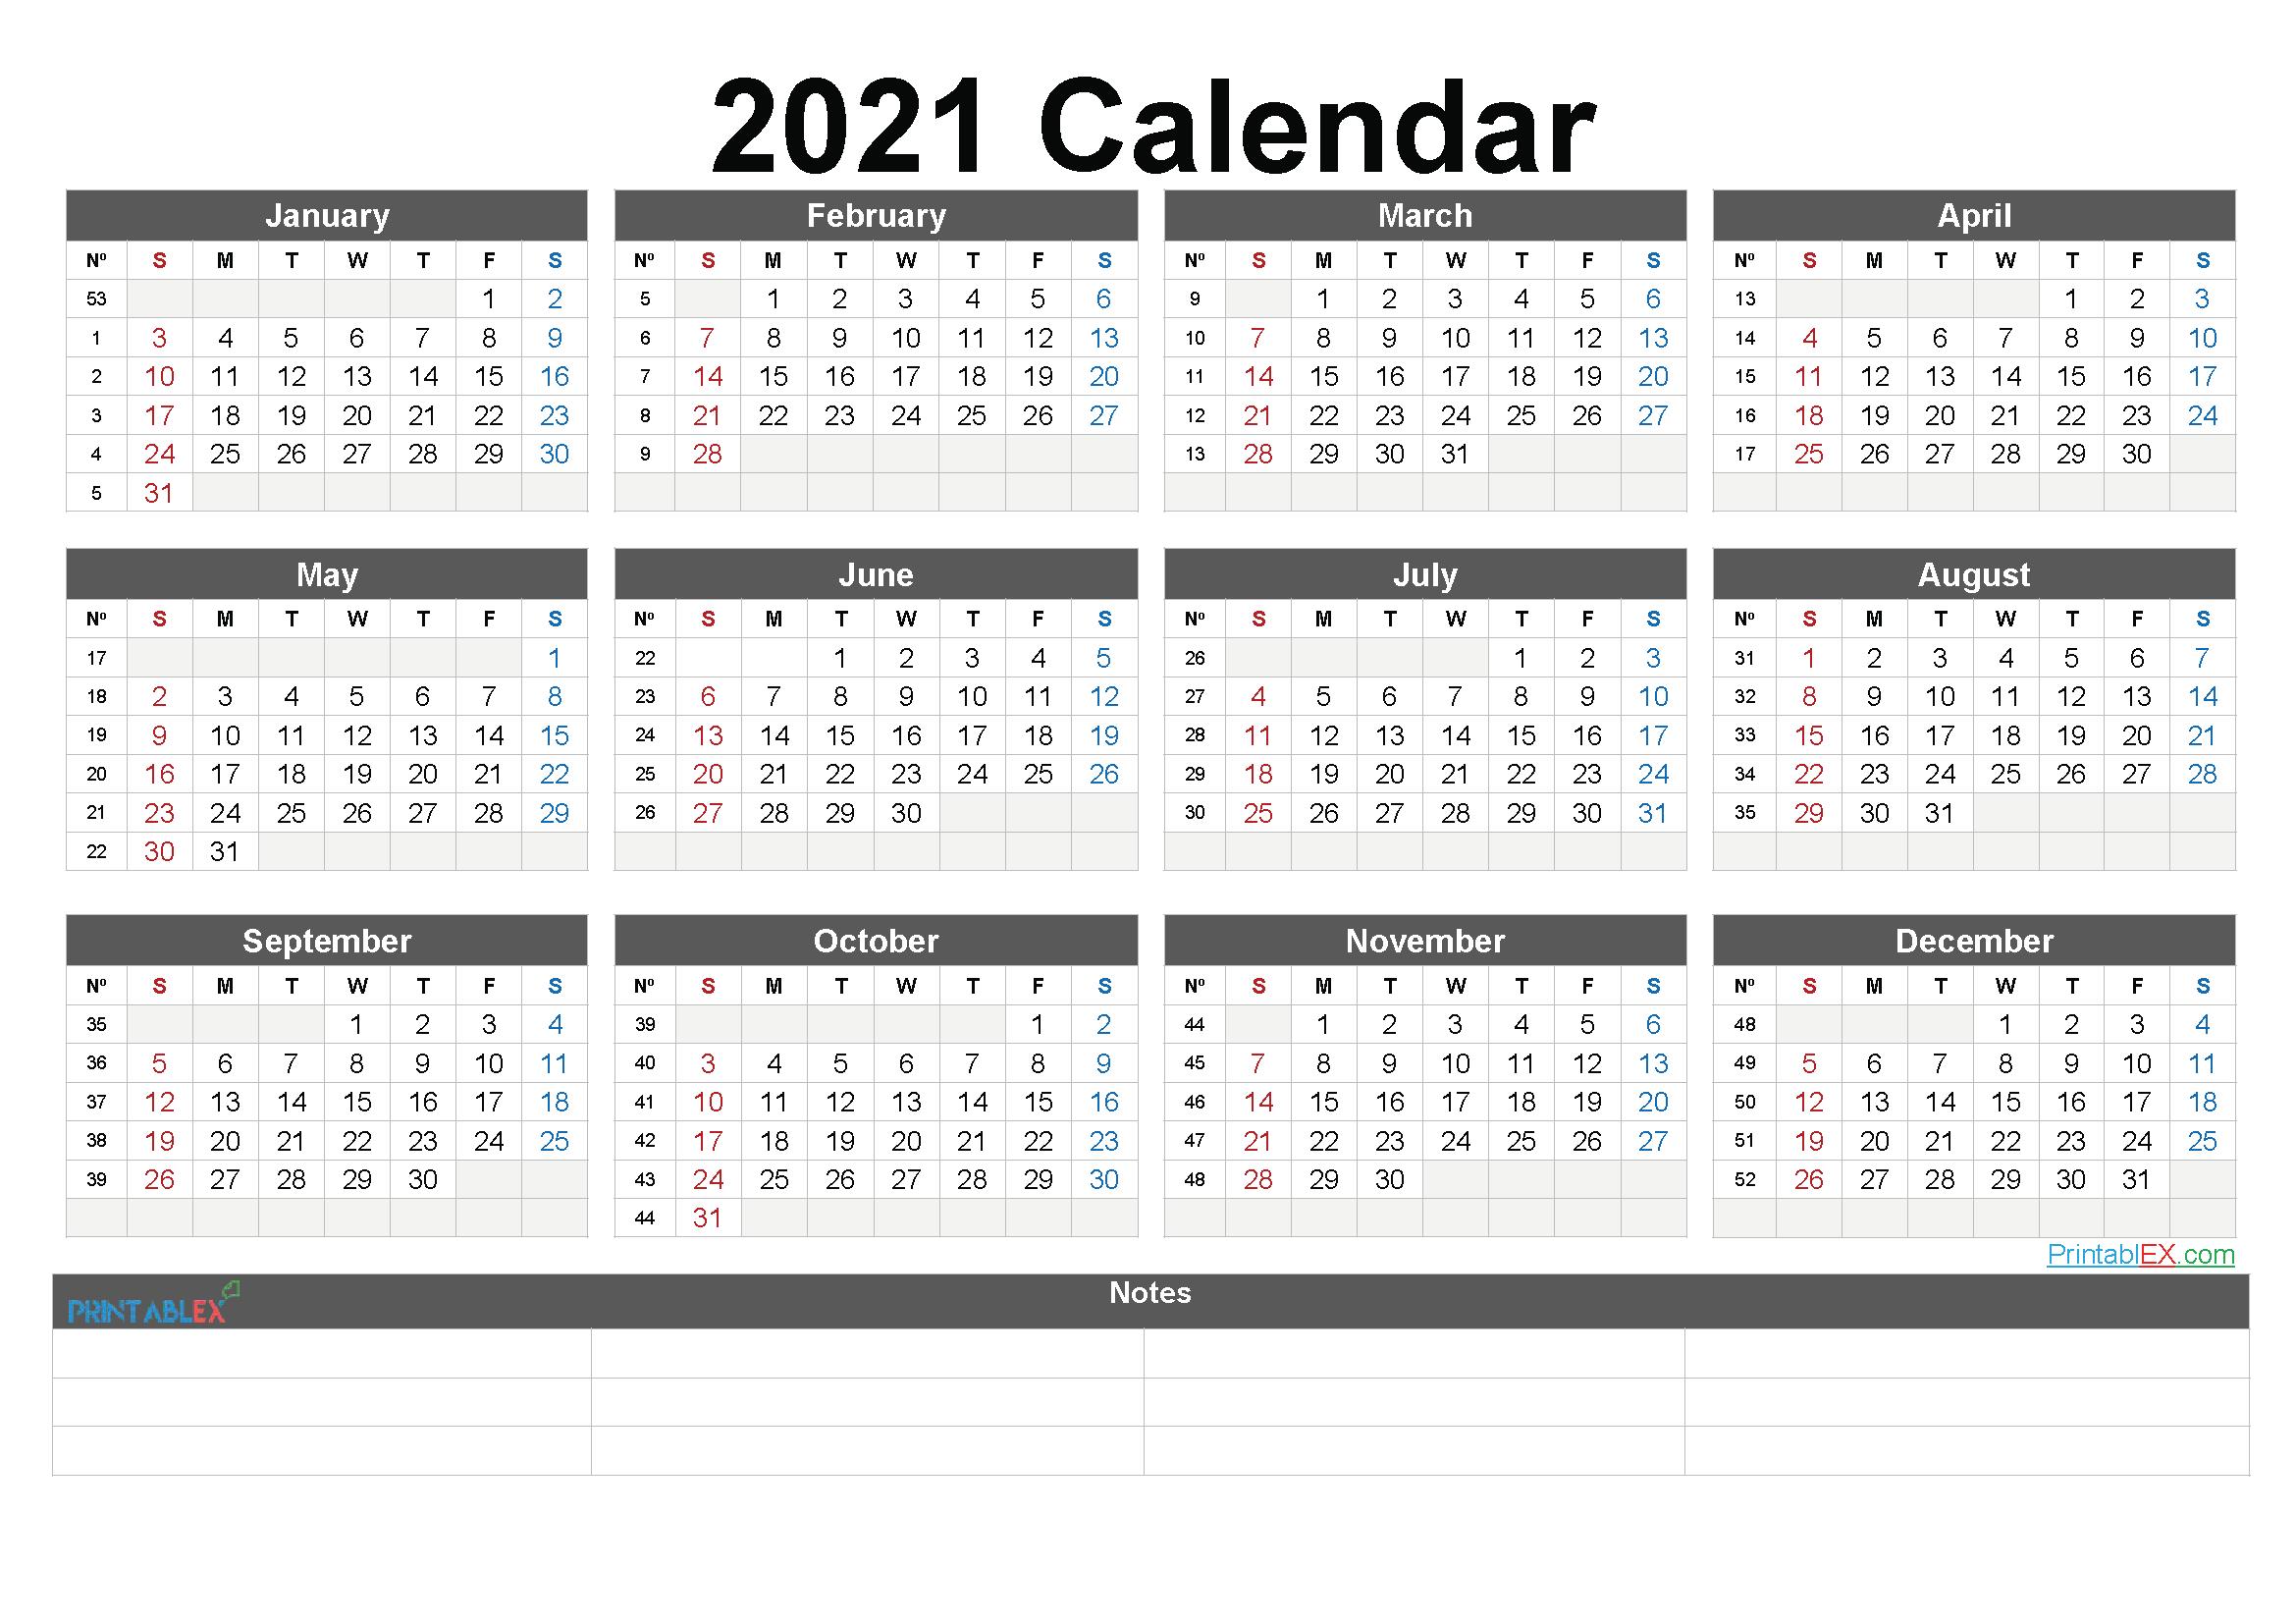 Free Printable 2021 Yearly Calendar – Free Printable 2020